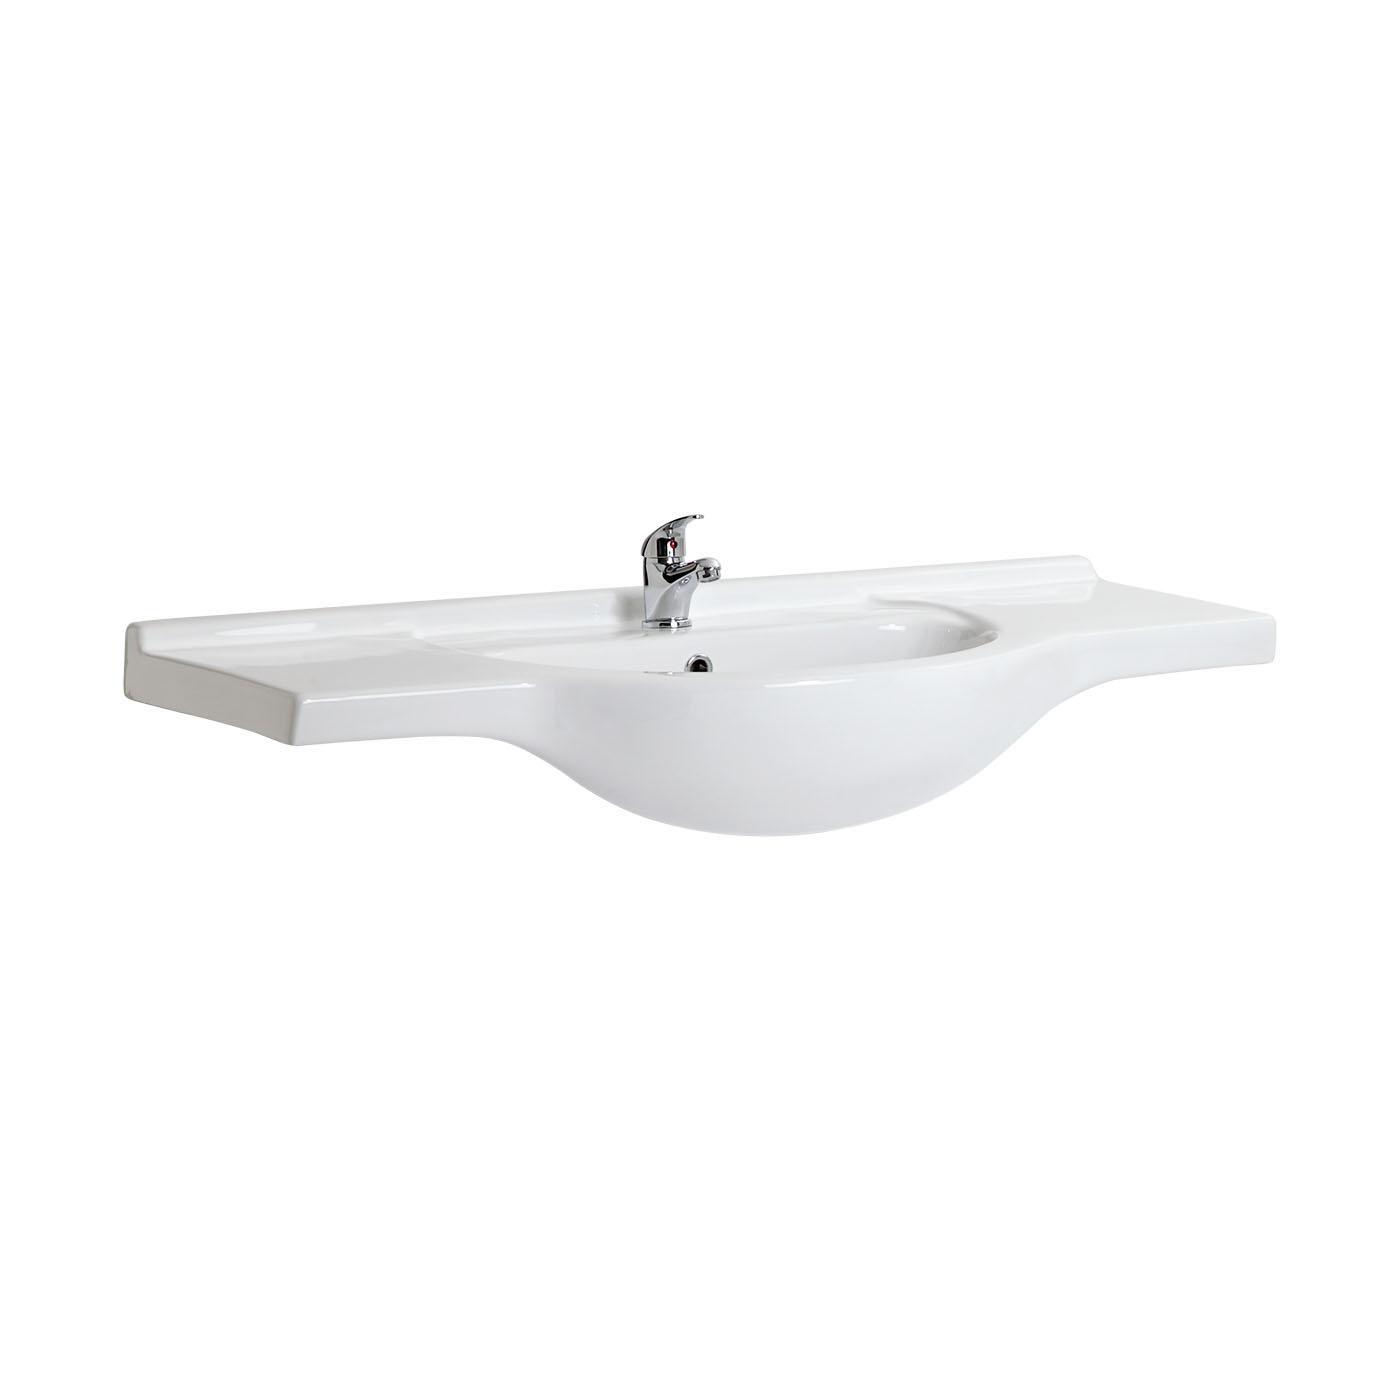 Milano 1050mm Standard Basin for Classic Vanity